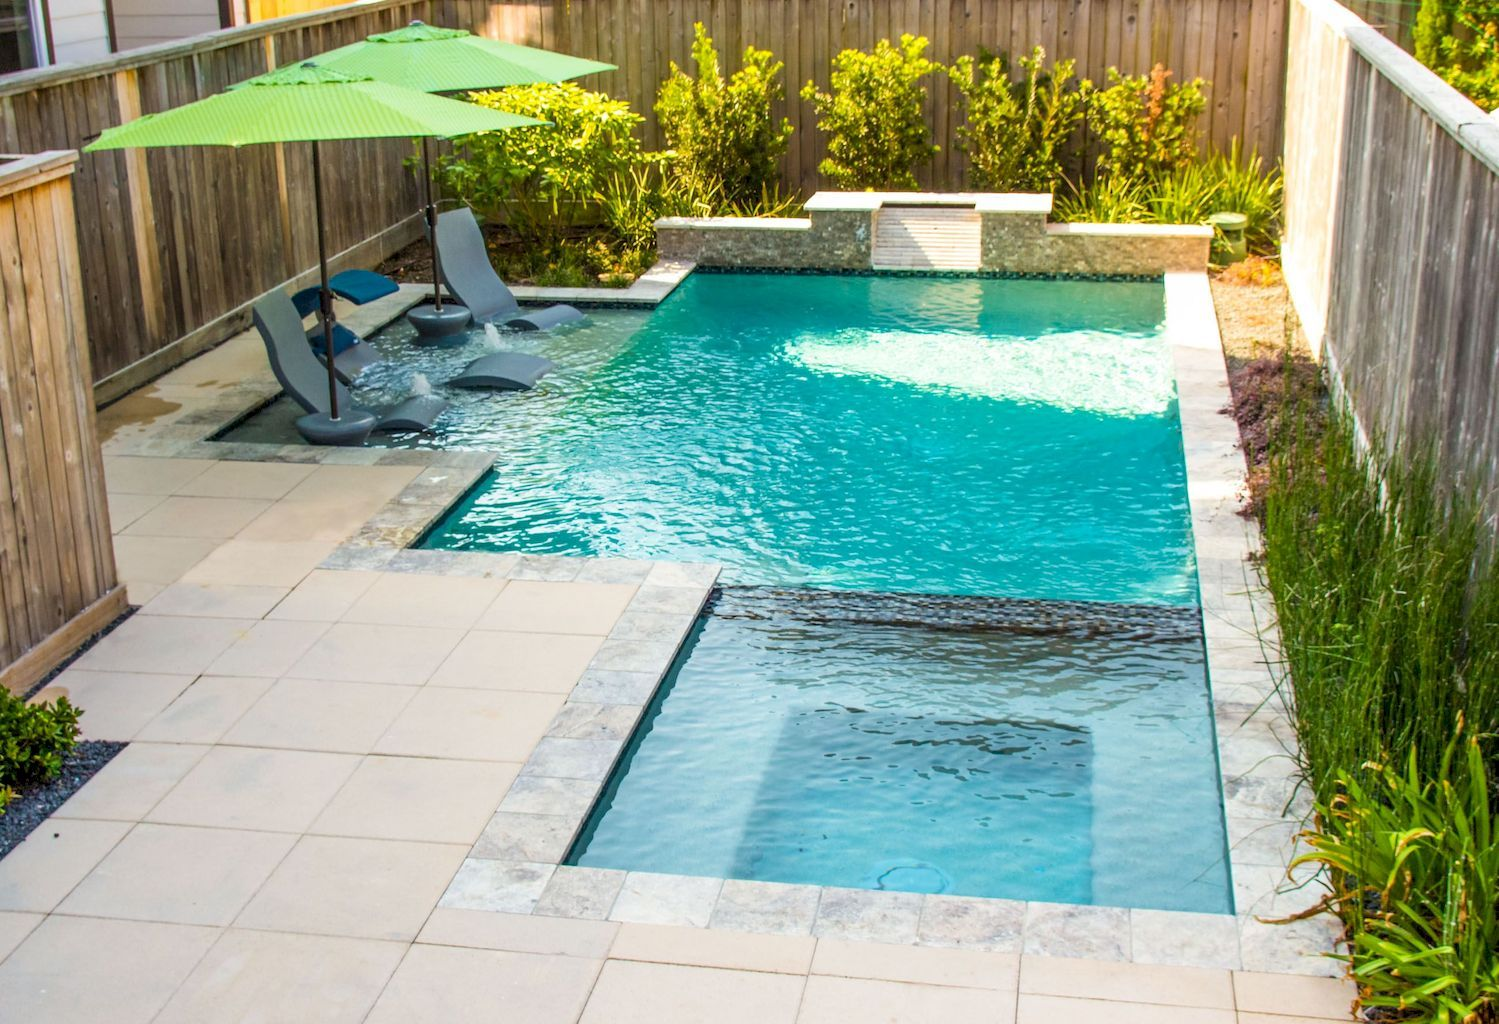 90 Small Backyard Swimming Pool Ideas And Design Swimming Pool